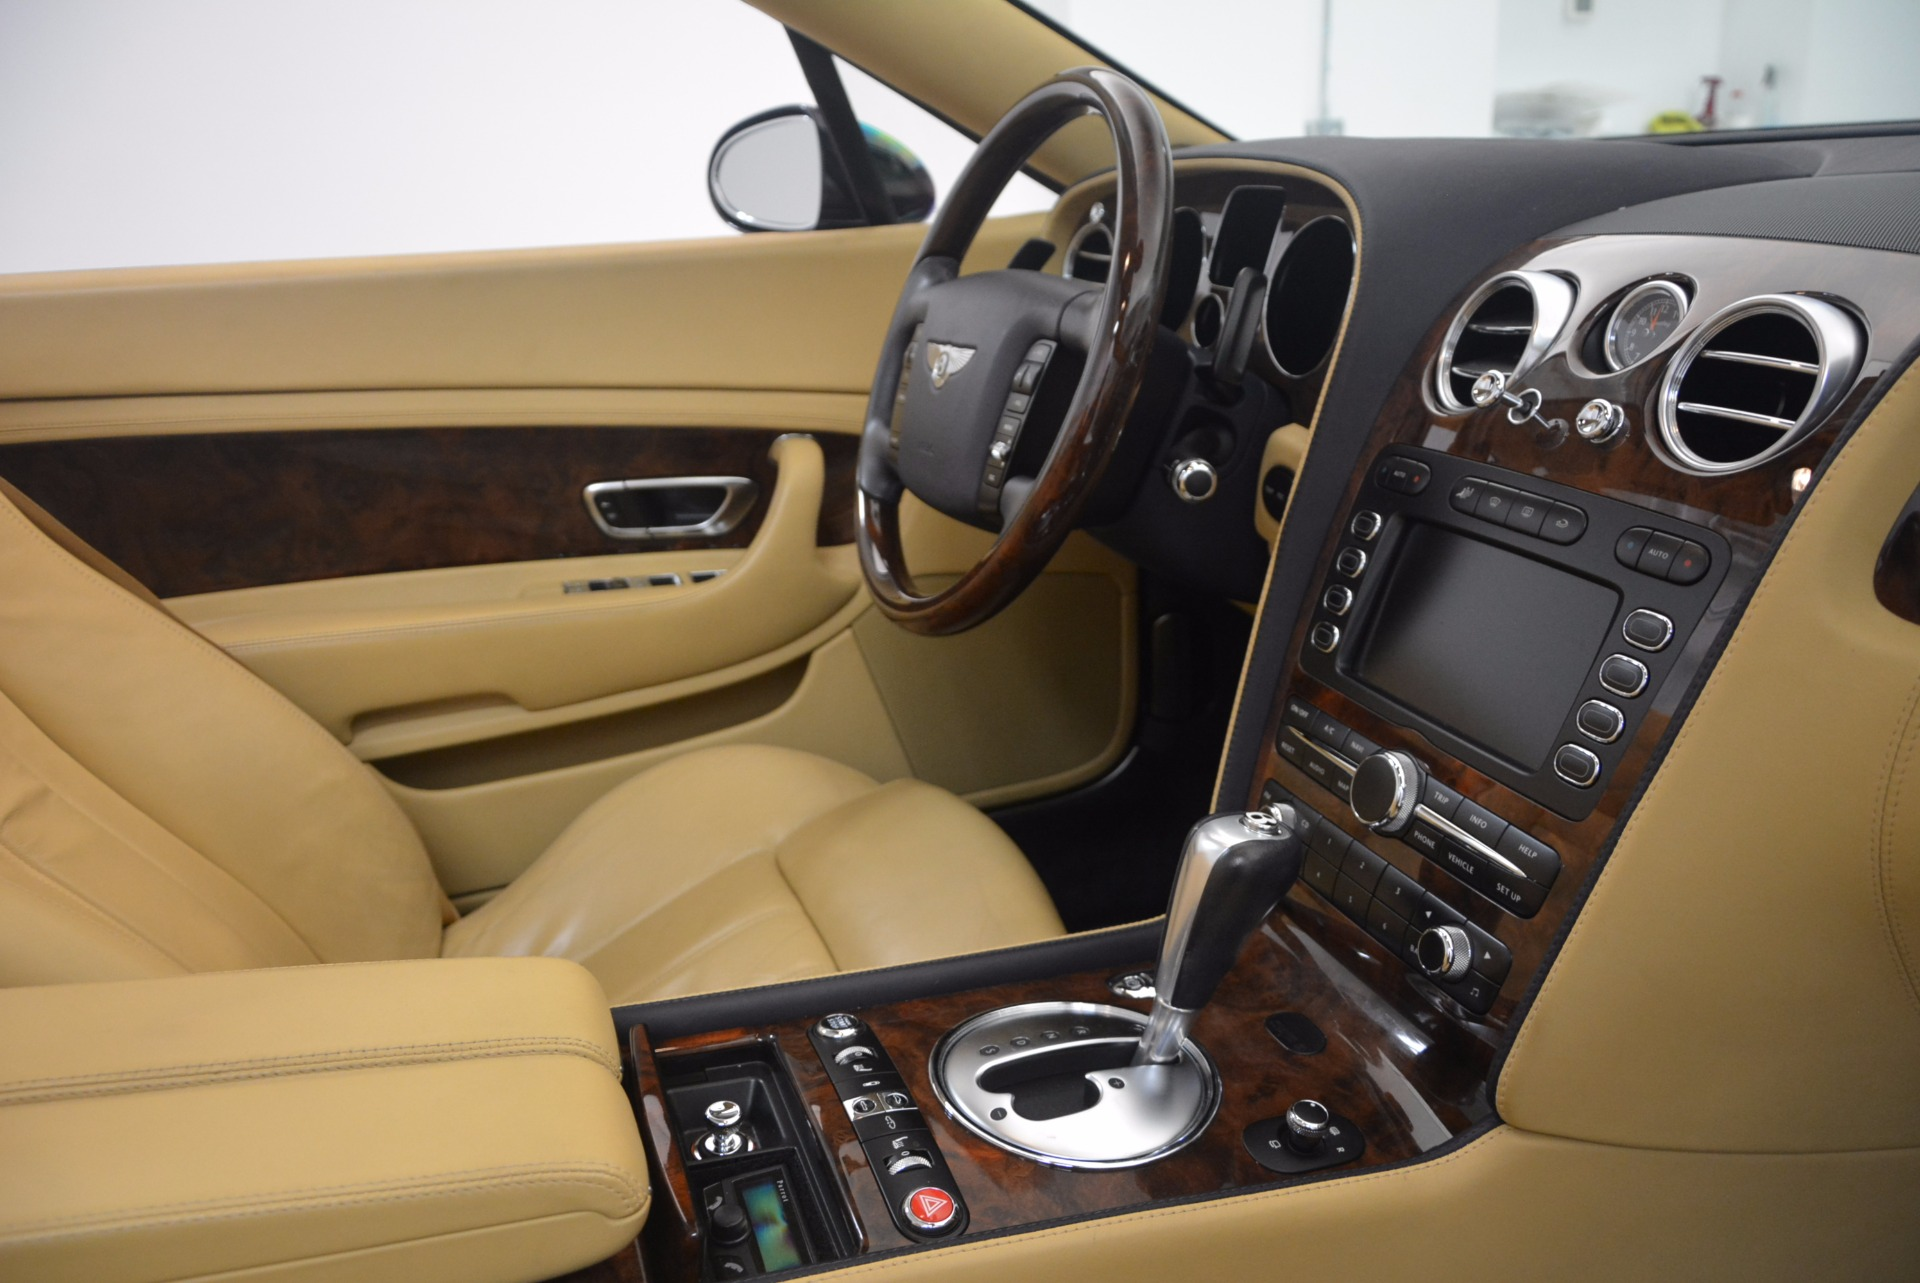 Used 2007 Bentley Continental GTC  For Sale In Westport, CT 1186_p48